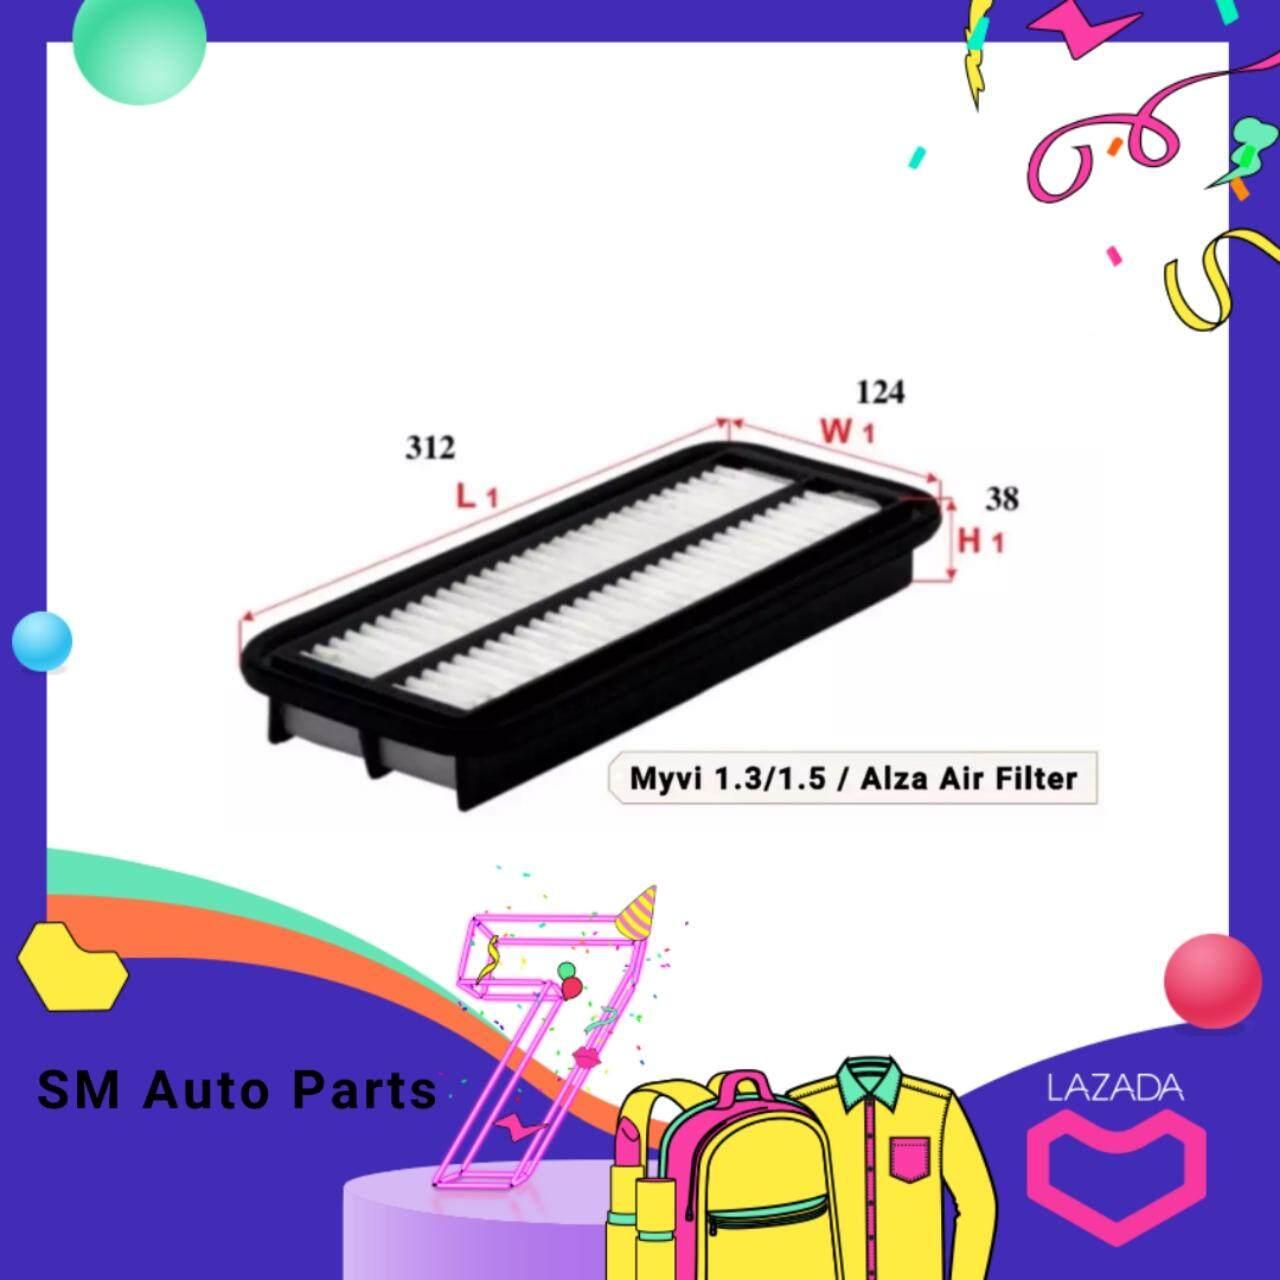 Alza/myvi1.3/myvi1.5 Oe Air Filter By Sm Auto Parts.